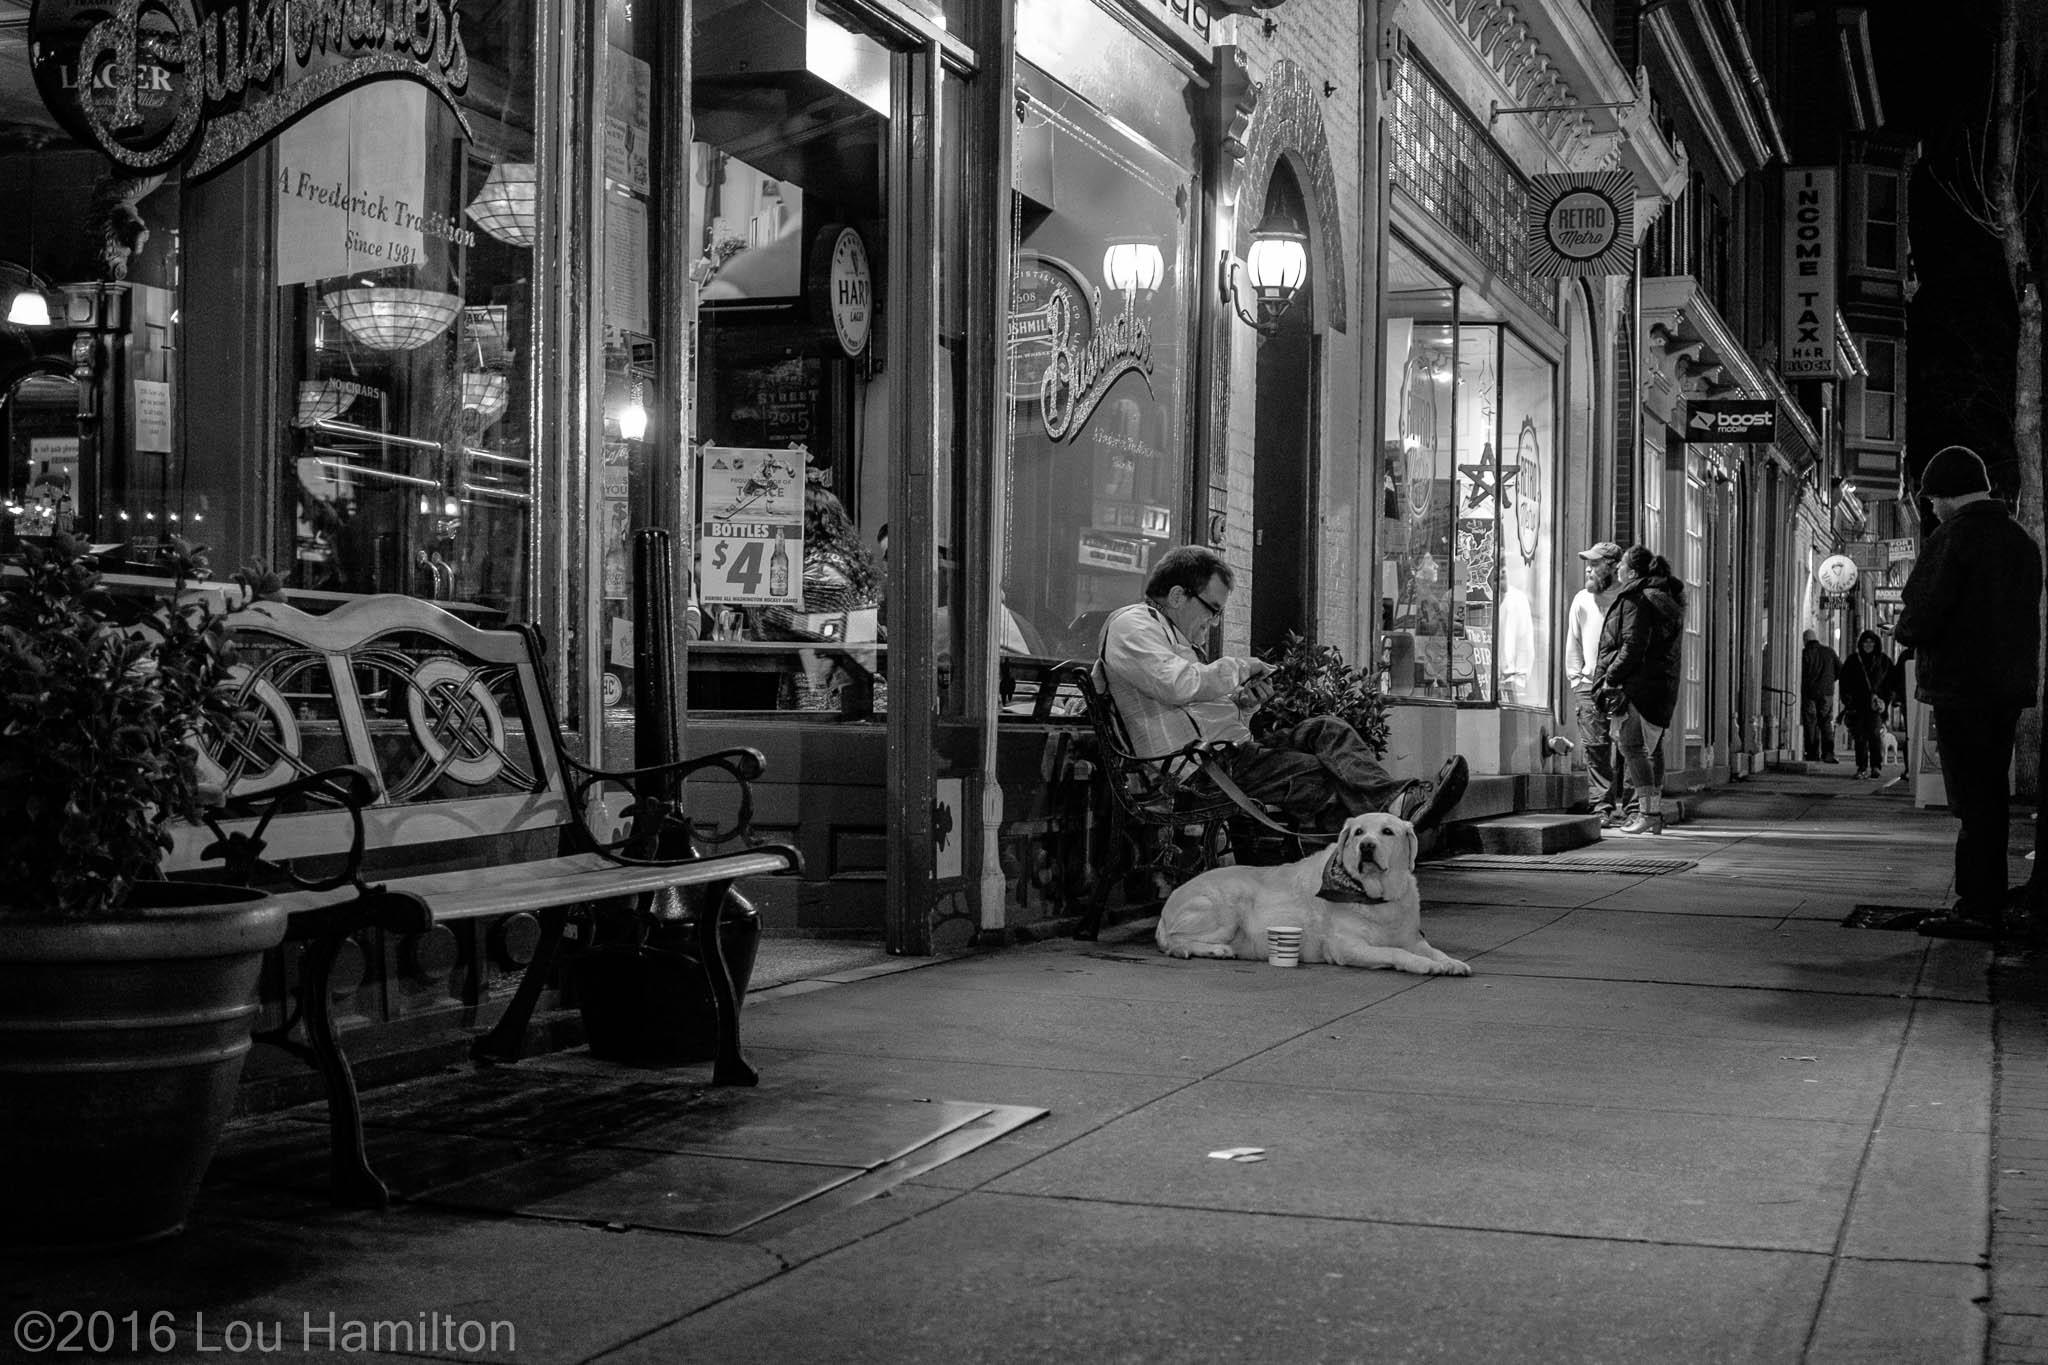 16 January 2016 -- Downtown Frederick, MD (Market Street)